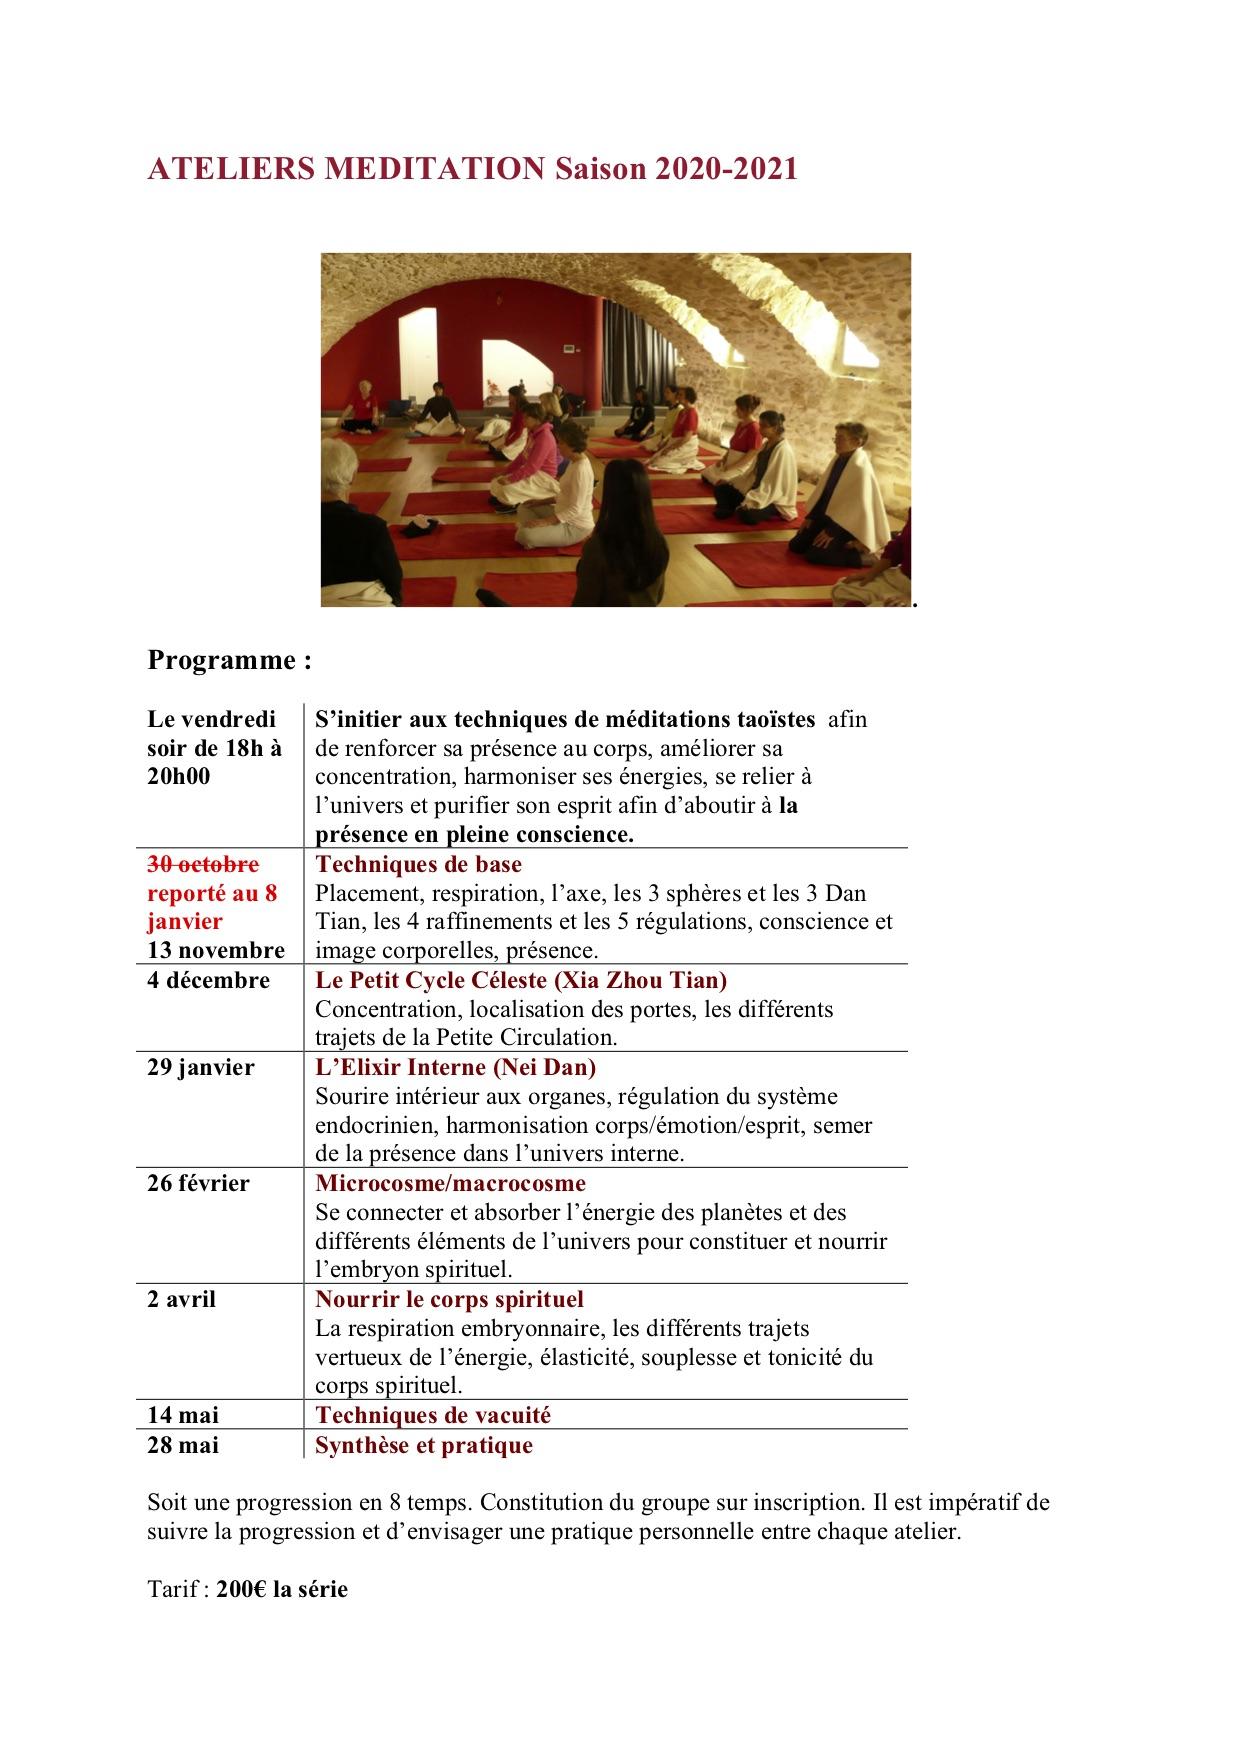 Ateliers Méditation 2020-2021